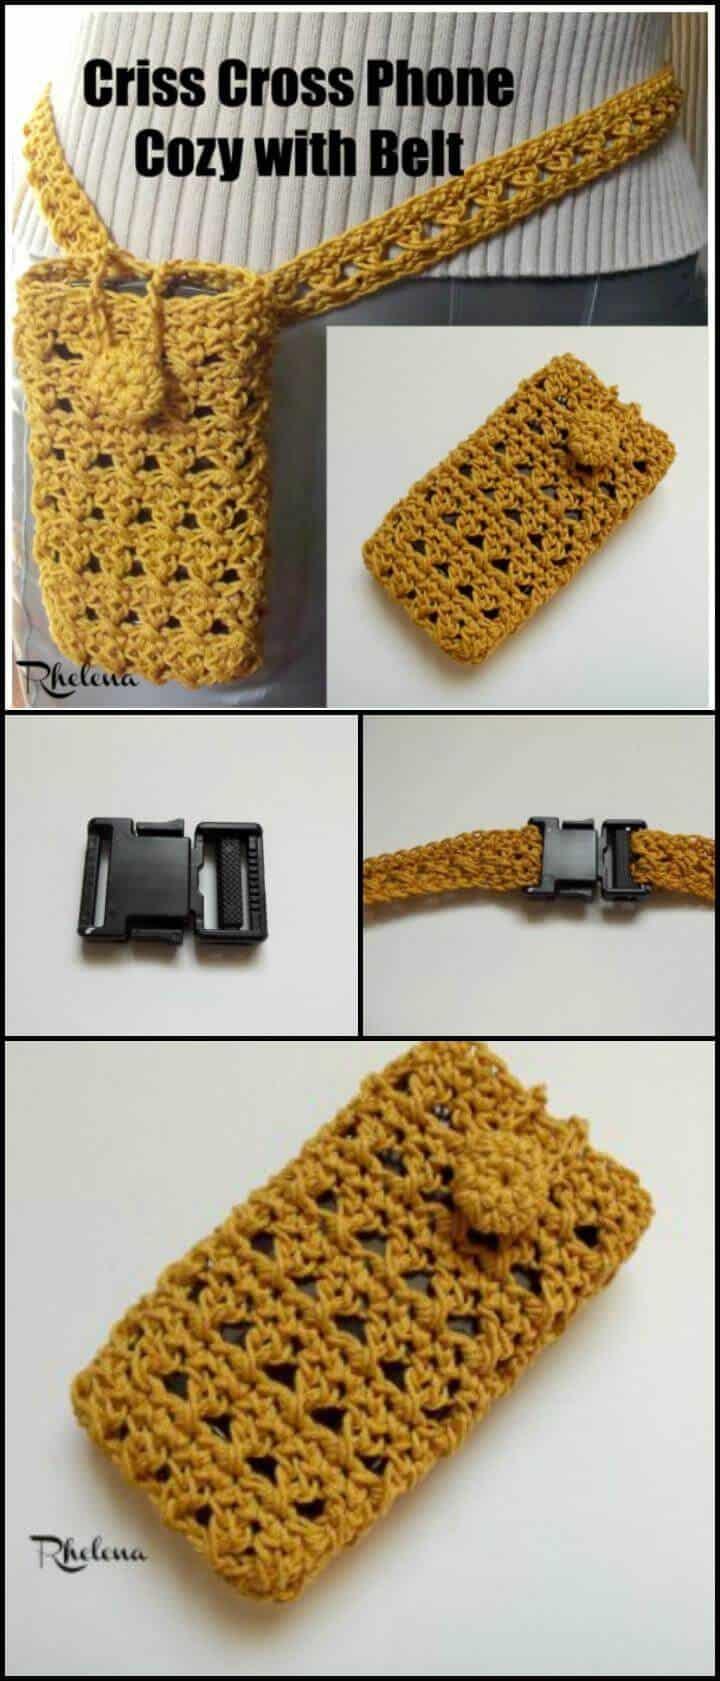 crochet criss cross phone acogedor con cinturón